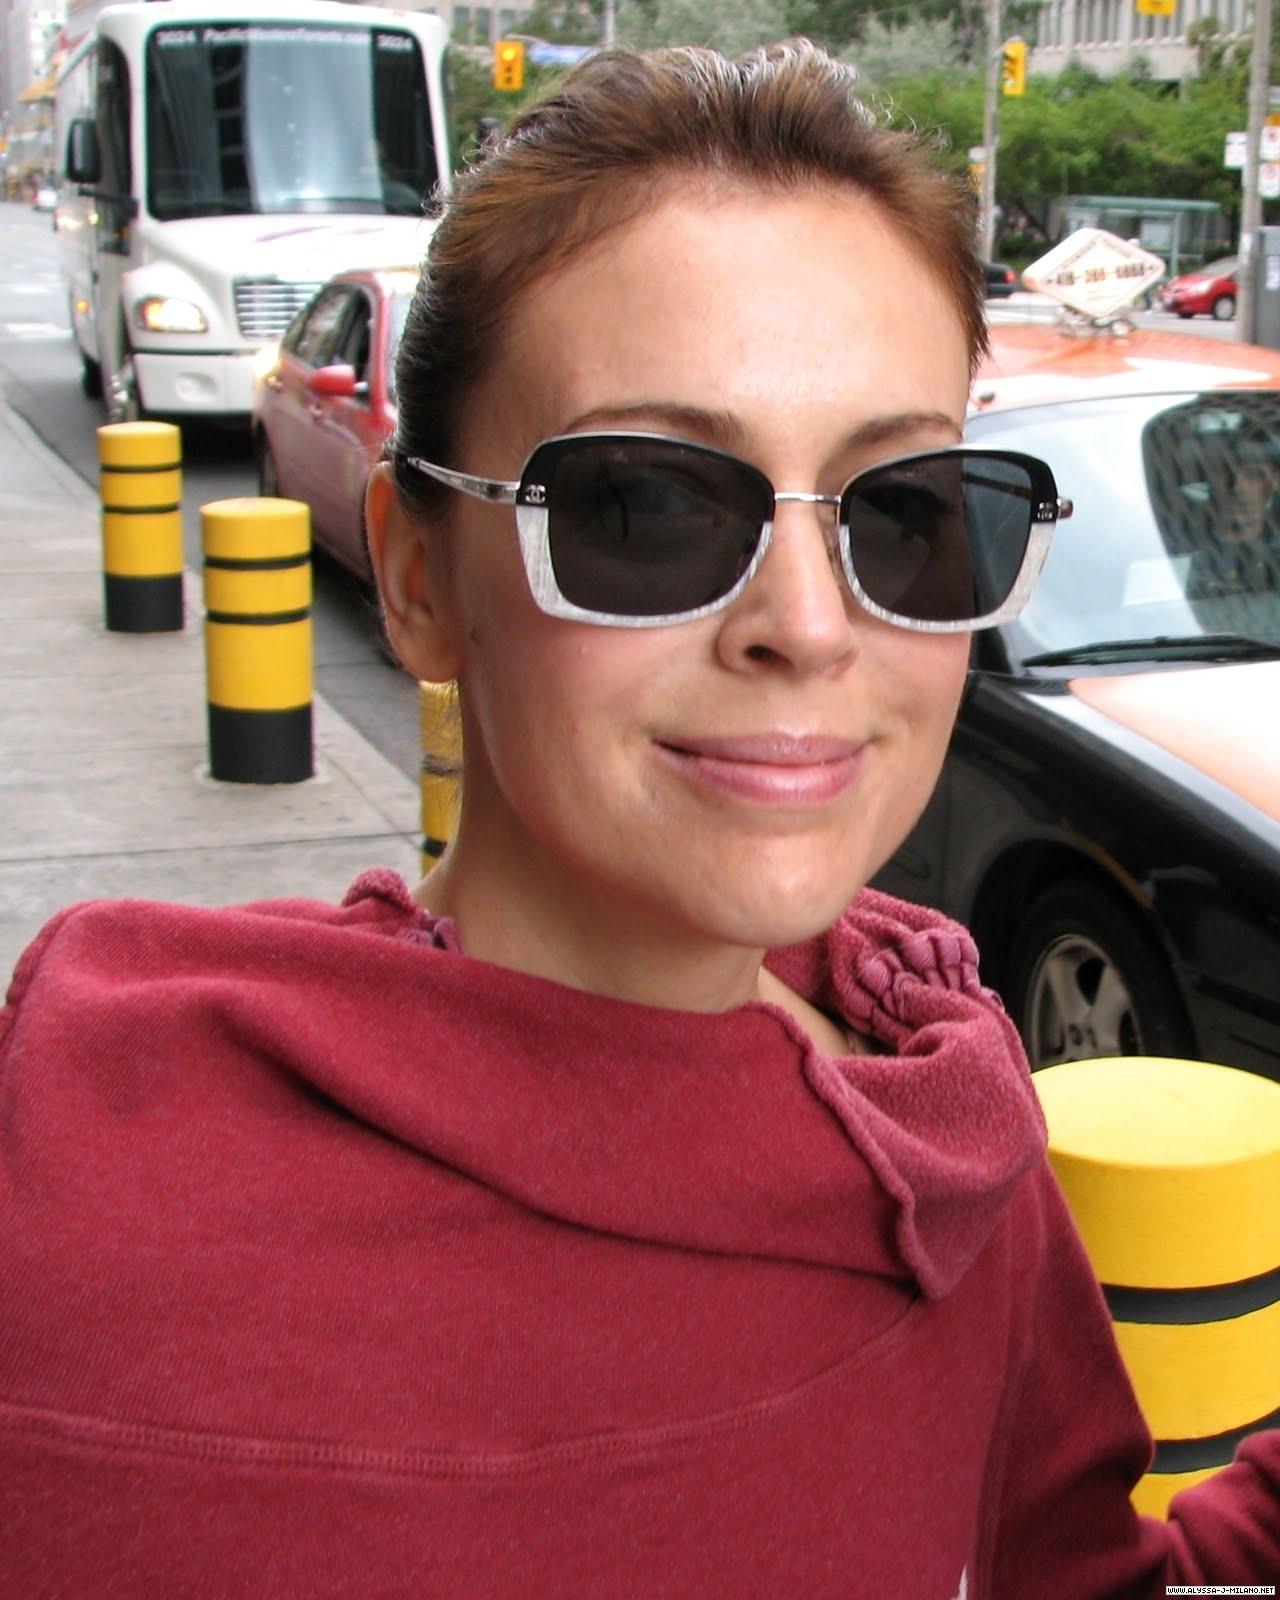 alyssa milano pictures 2010